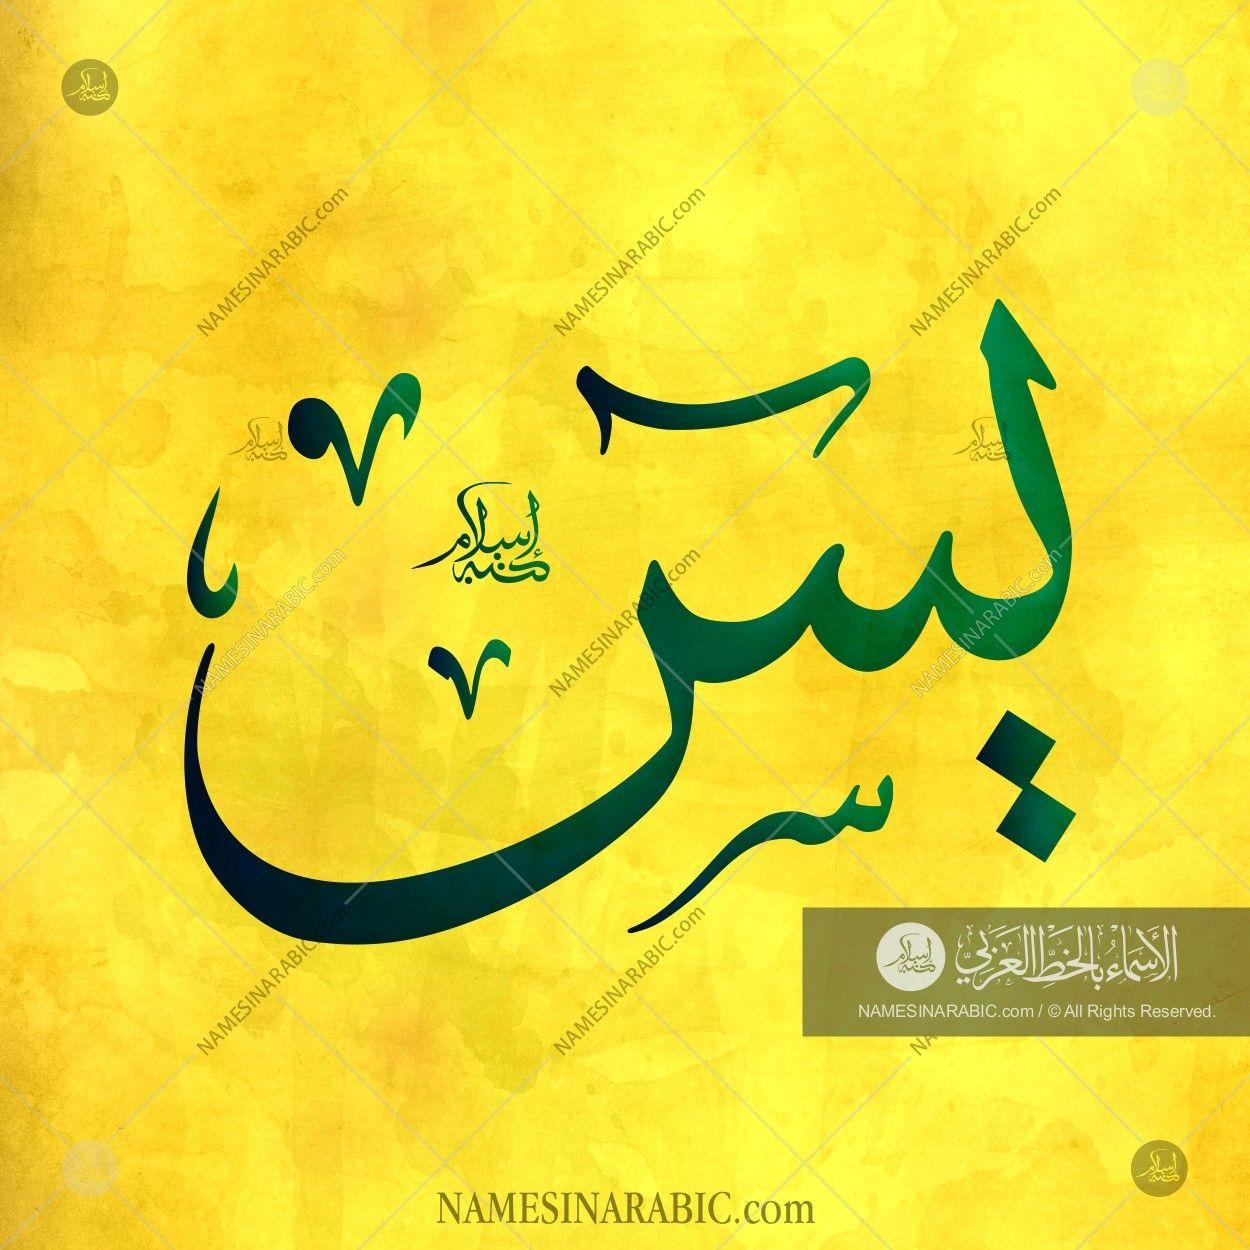 Yasin Name In Arabic Calligraphy Islamic Art Calligraphy Islamic Calligraphy Arabic Calligraphy Art